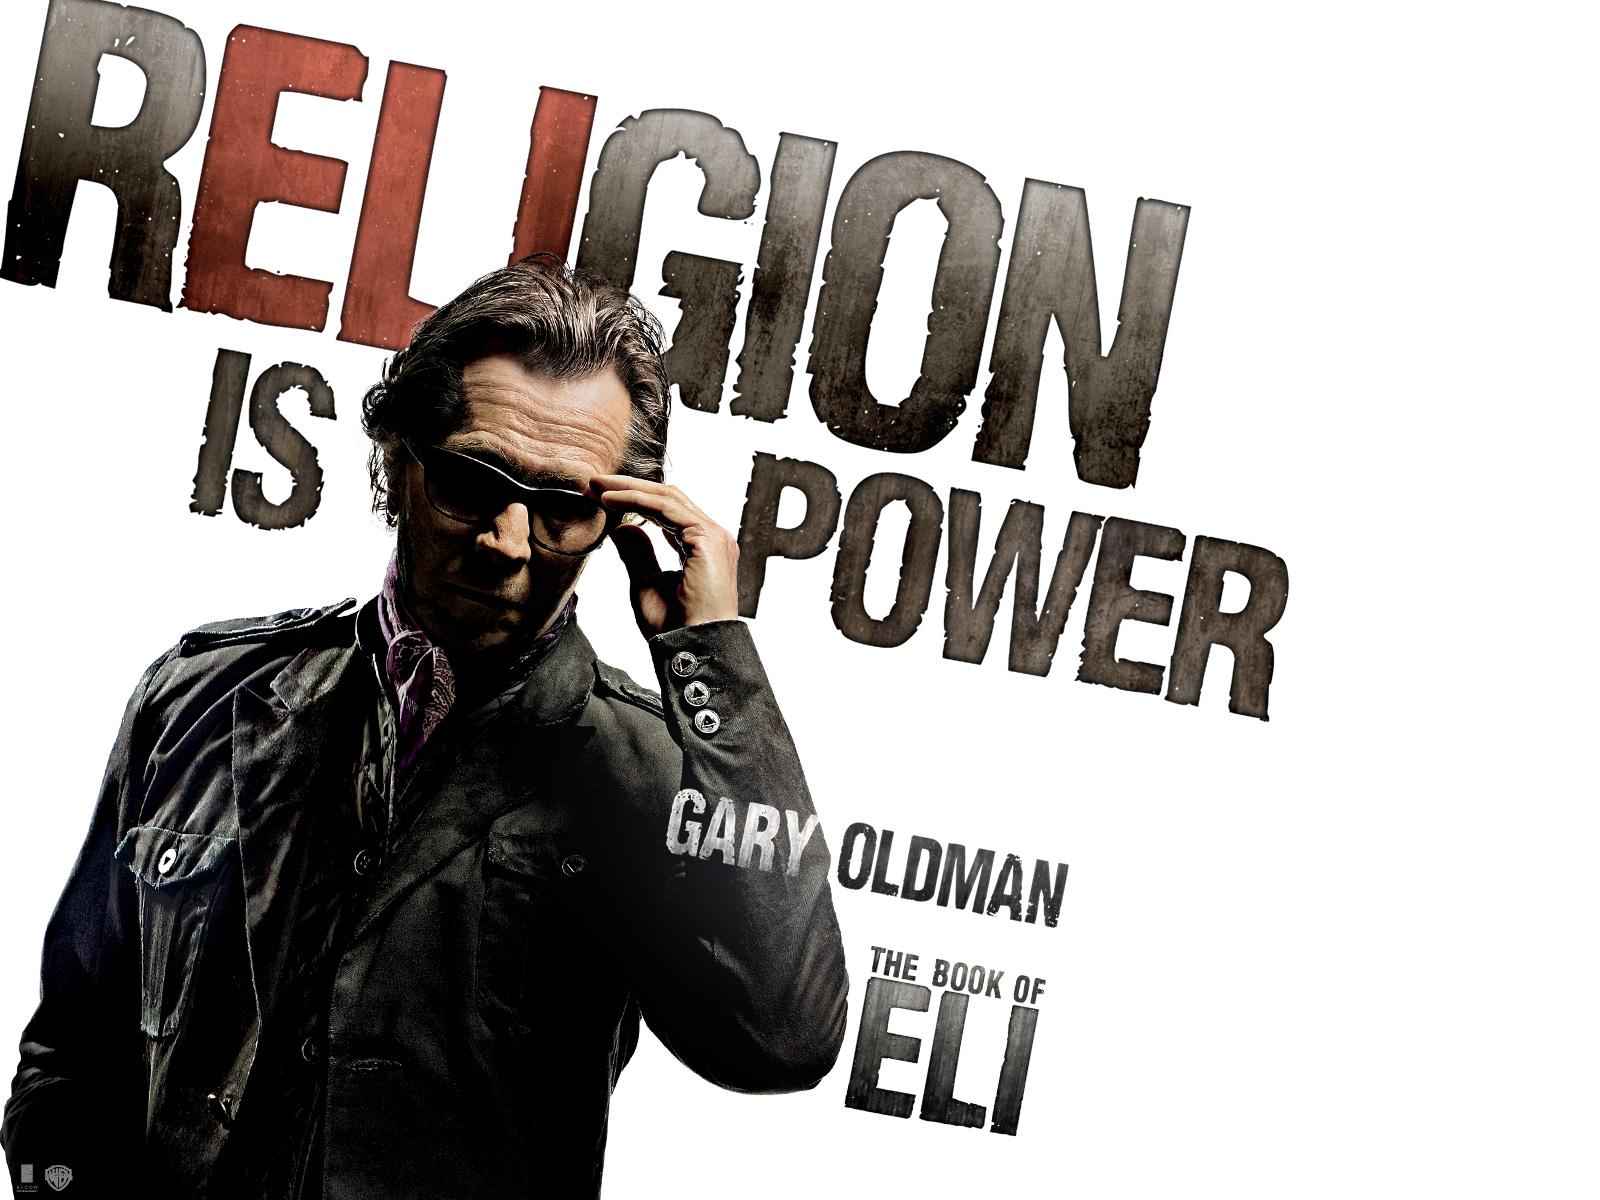 http://4.bp.blogspot.com/-9MZ7cyj279A/Tlb4fzX9jqI/AAAAAAAAApU/o6QxNZ8d85E/s1600/www.Vvallpaper.net_Gary_Oldman_in_The_Book_of_Eli_Wallpaper_1600x1200_religion_is_power_carnegie.jpg